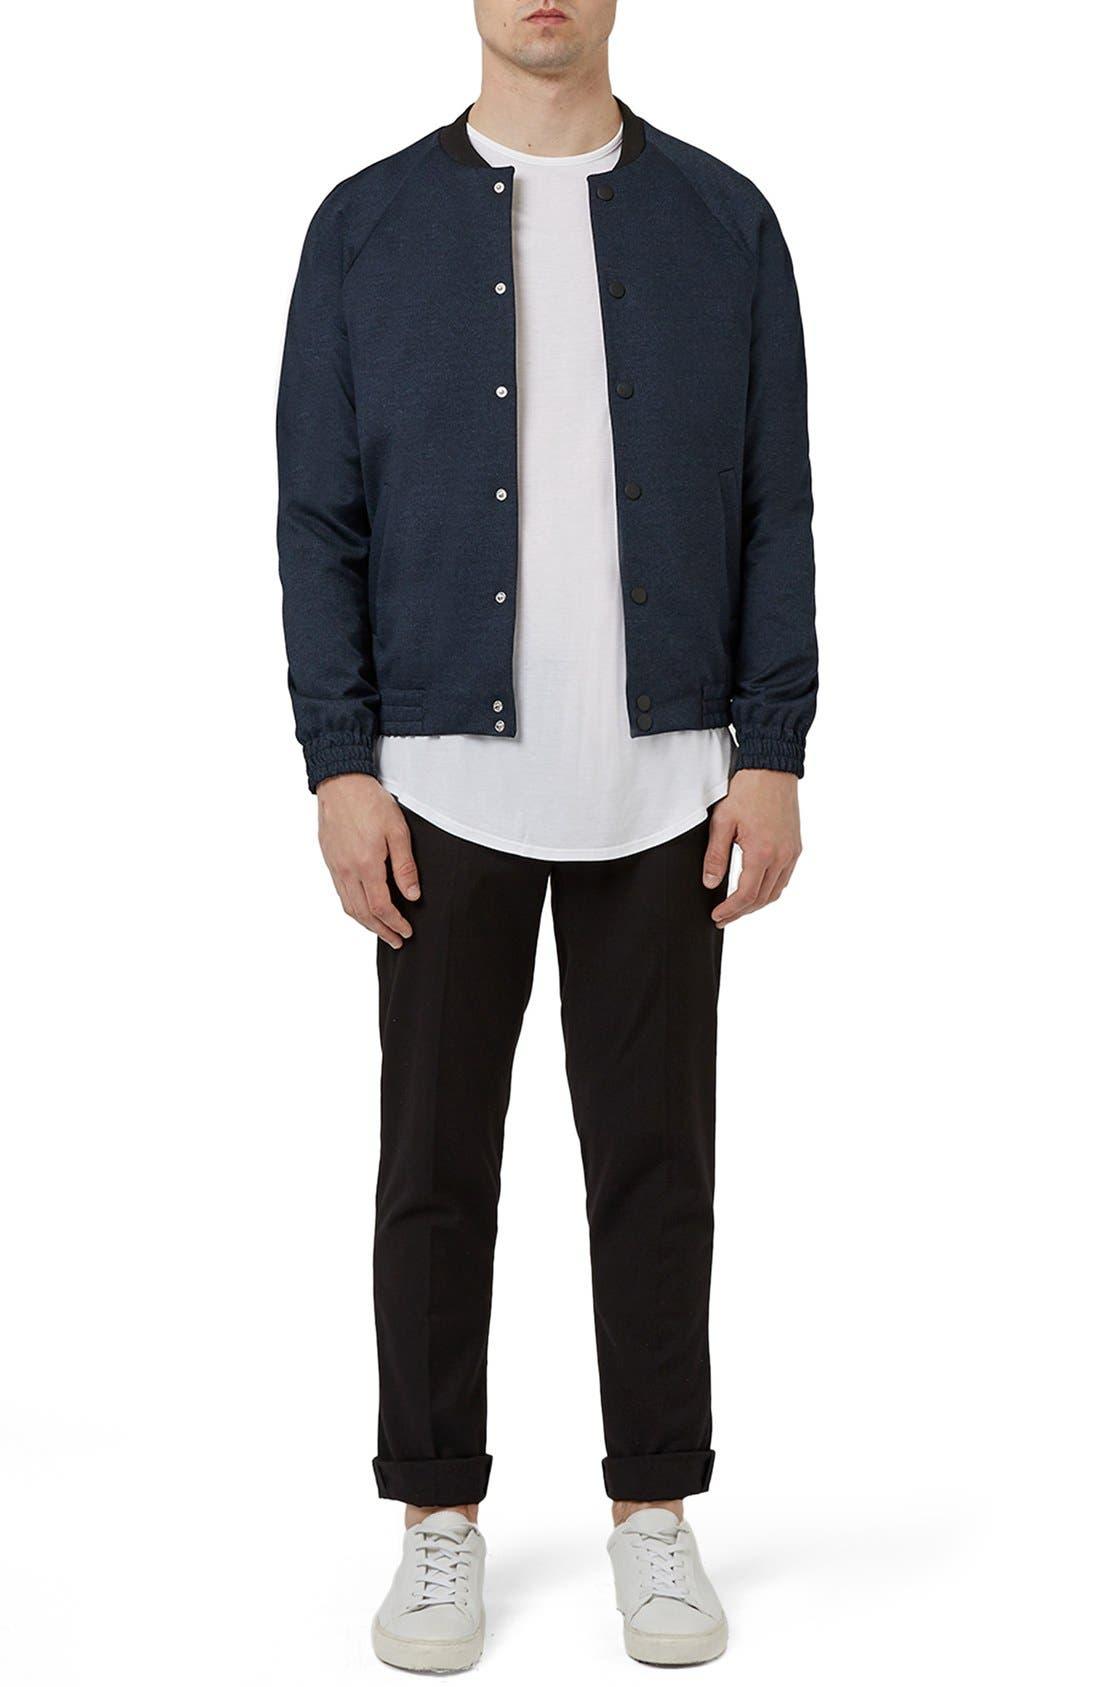 TOPMAN,                             Tailored Fit Raglan Bomber Jacket,                             Alternate thumbnail 5, color,                             410